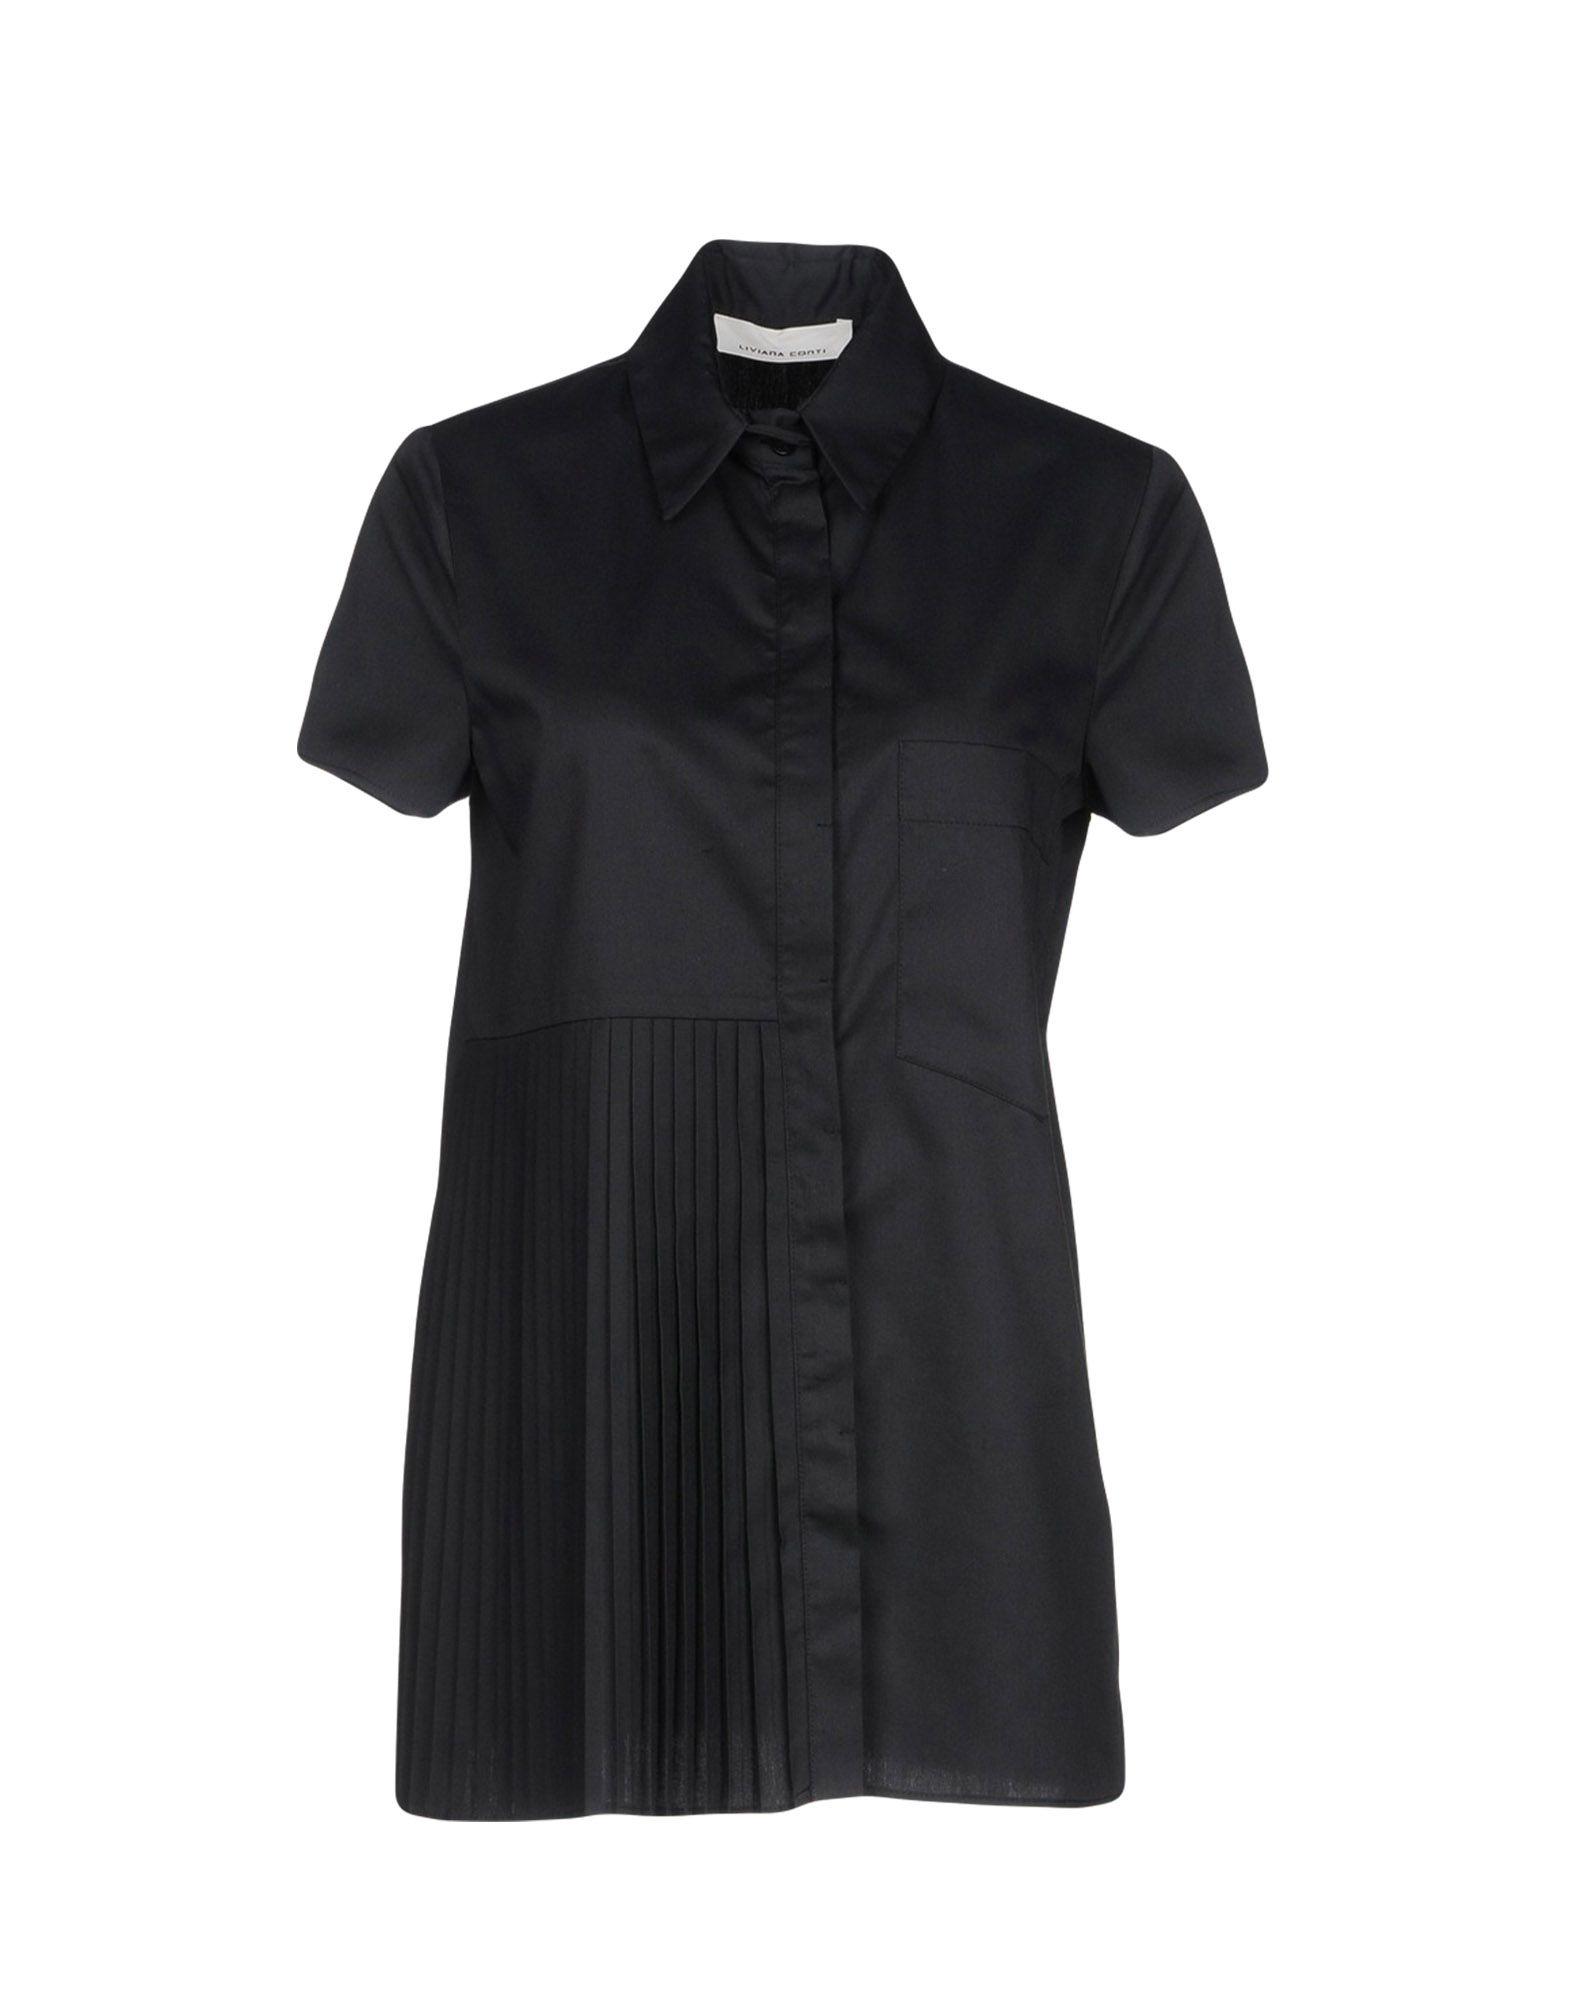 LIVIANA CONTI Damen Hemd Farbe Schwarz Größe 7